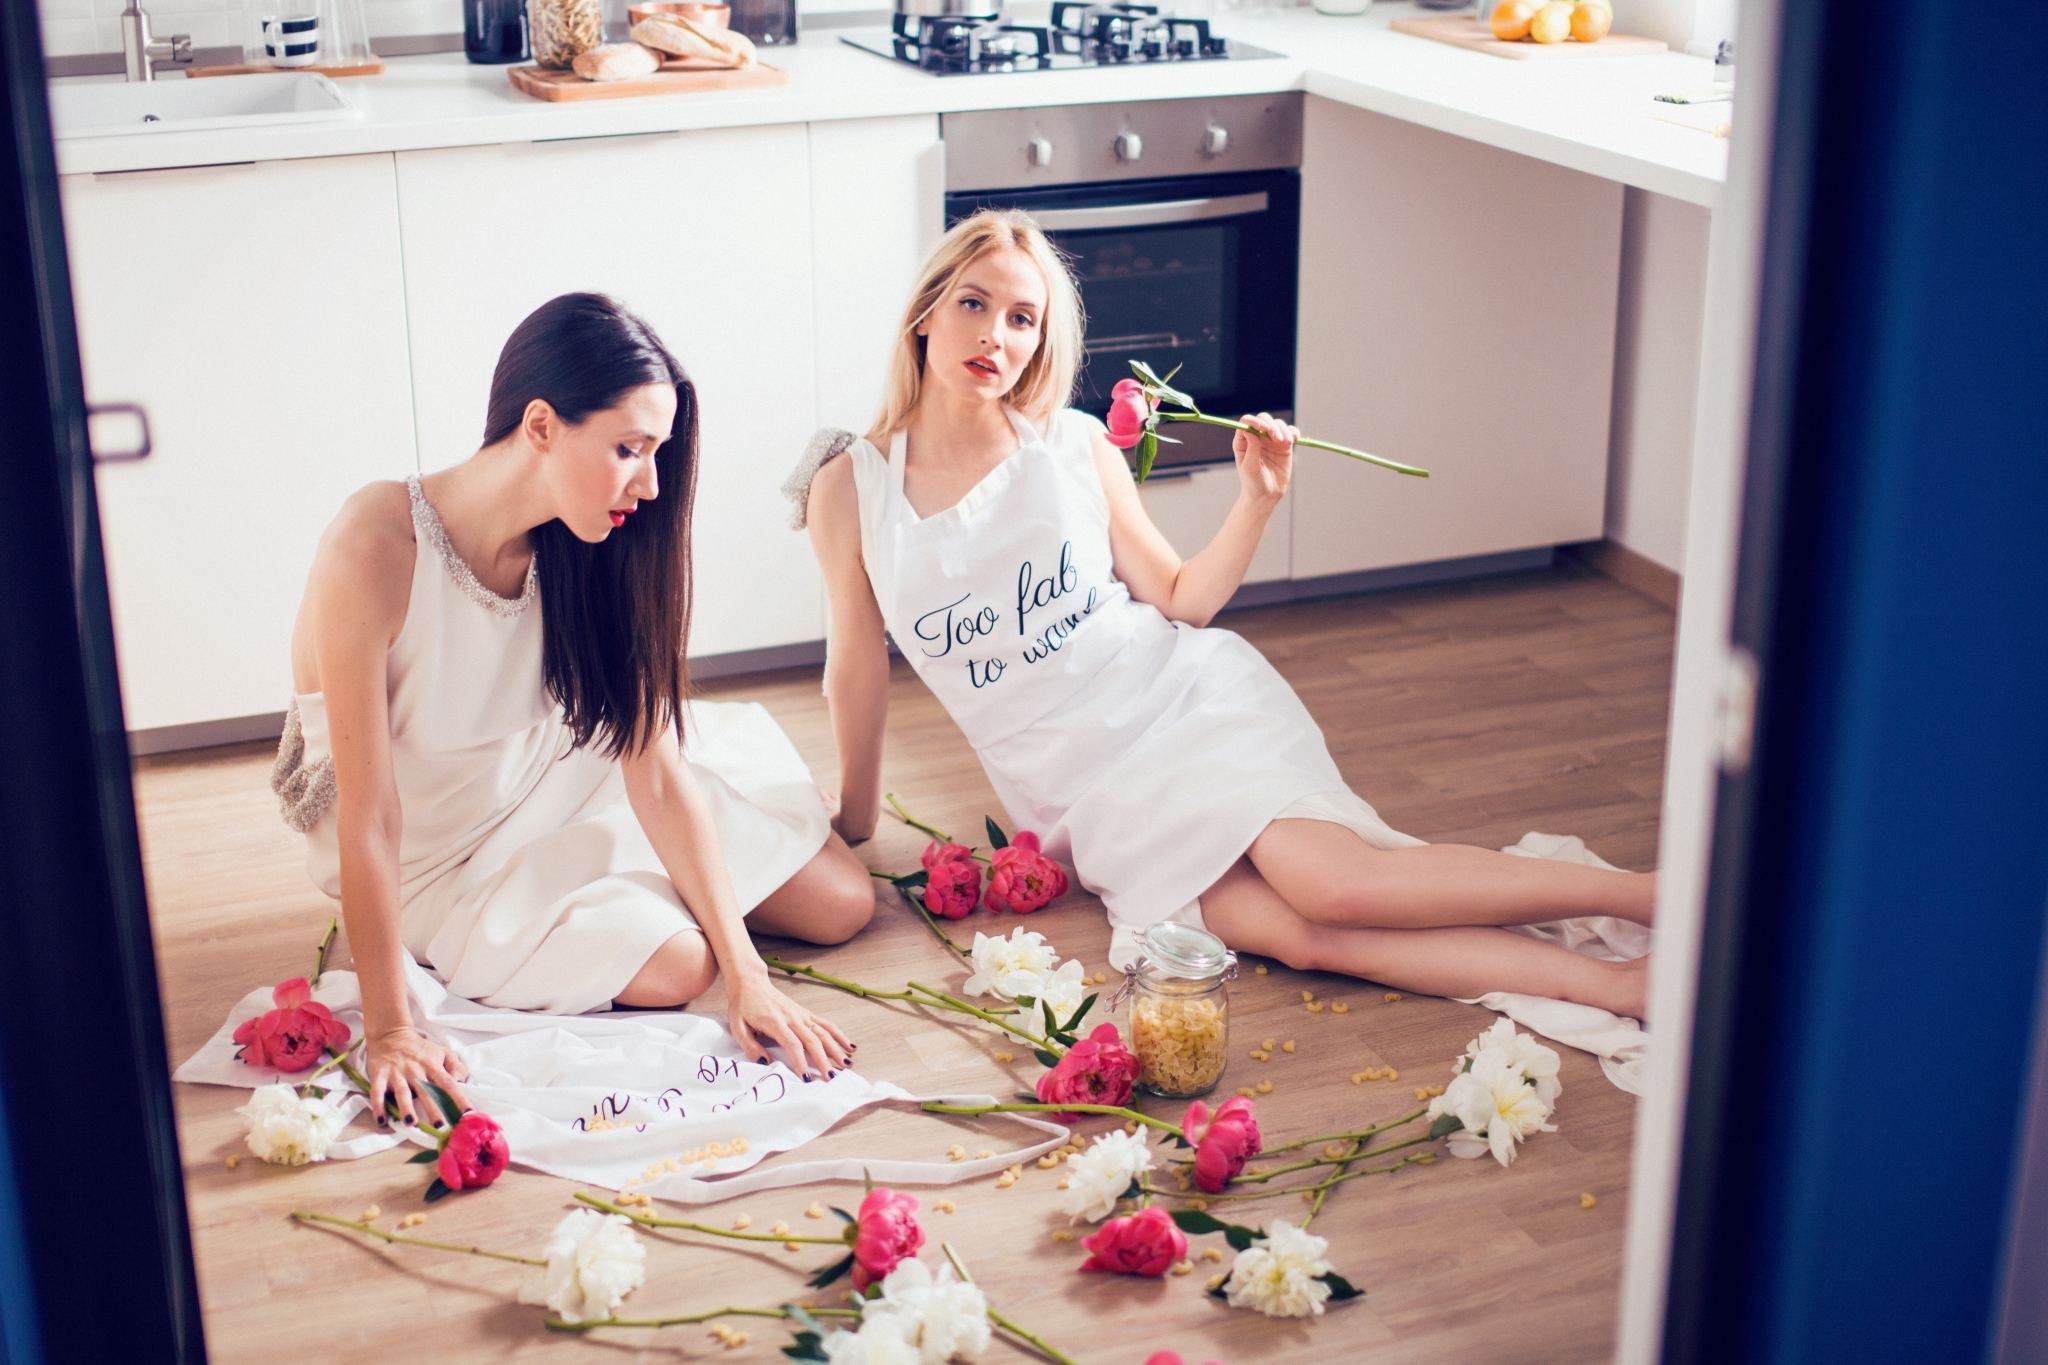 9Fabulous_Muses_Cake_Cooking_Whirlpool_Diana_Enciu_Alina_Tanasa_Parlor_retete_dulciuri